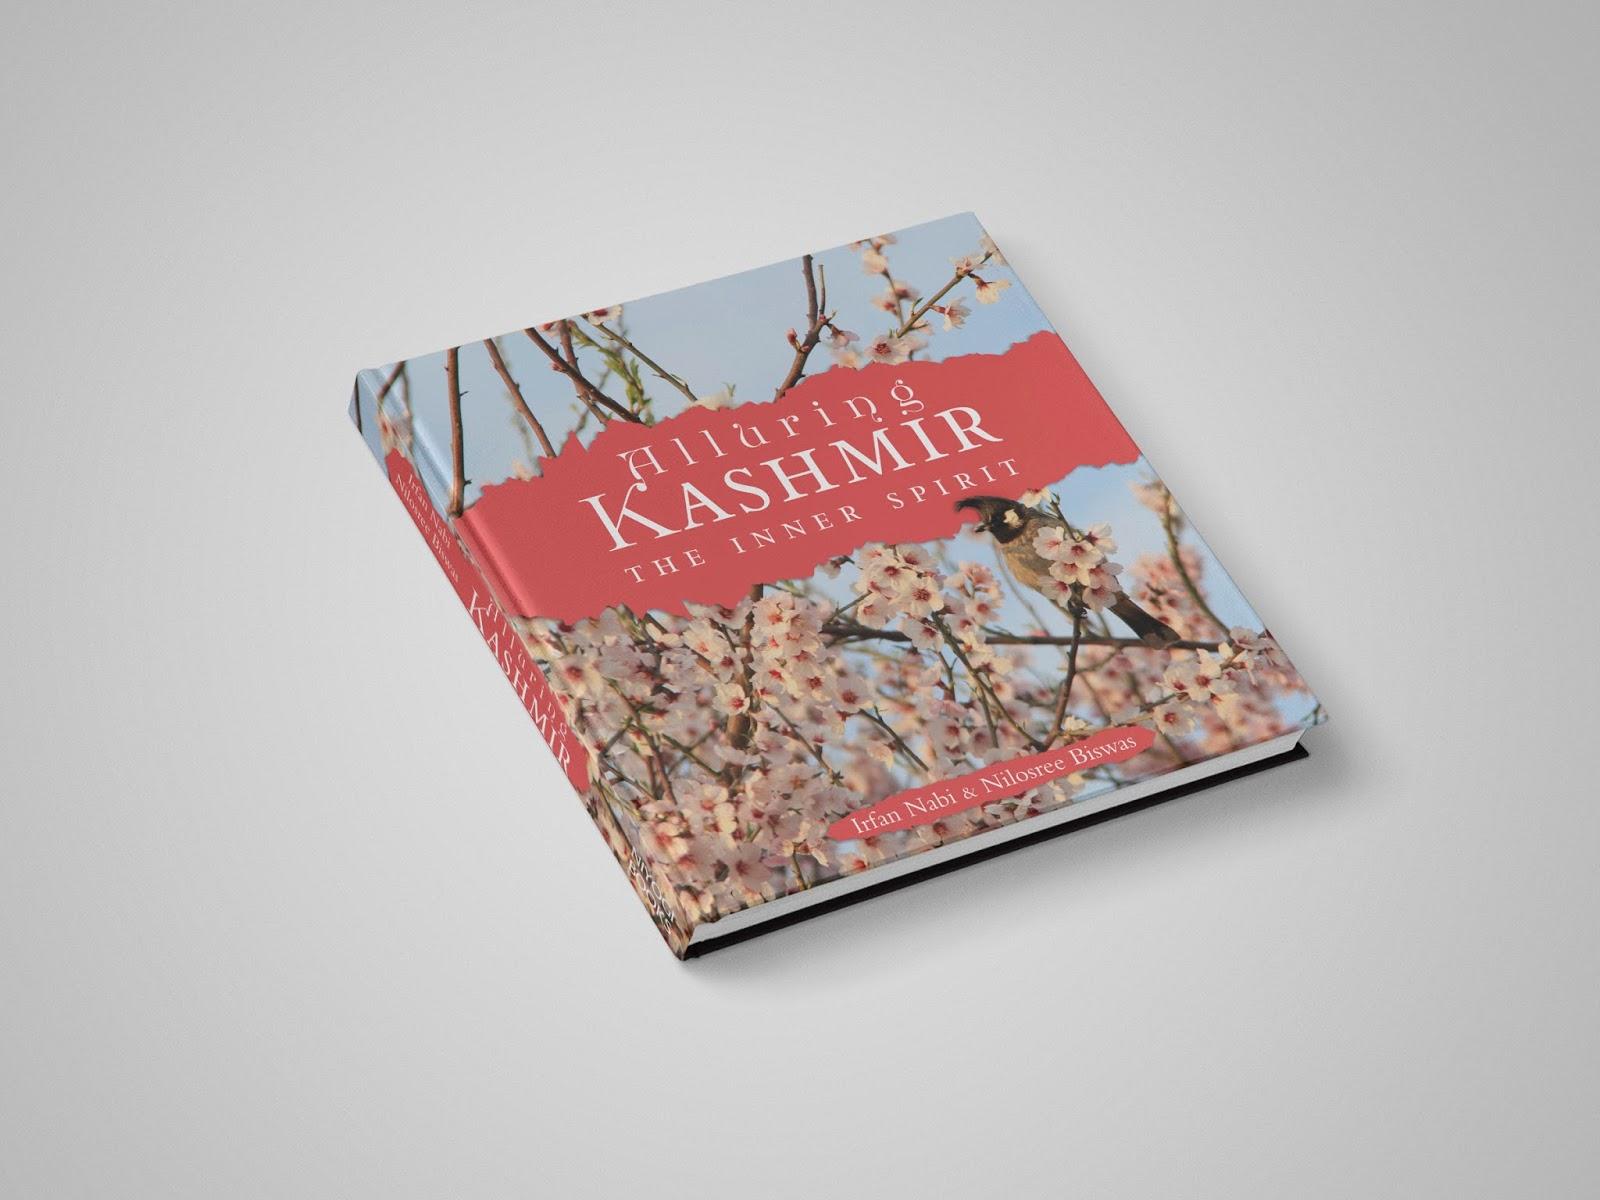 mishmash Alluring Kashmir by Irfan Nabi & Nilosree Biswas